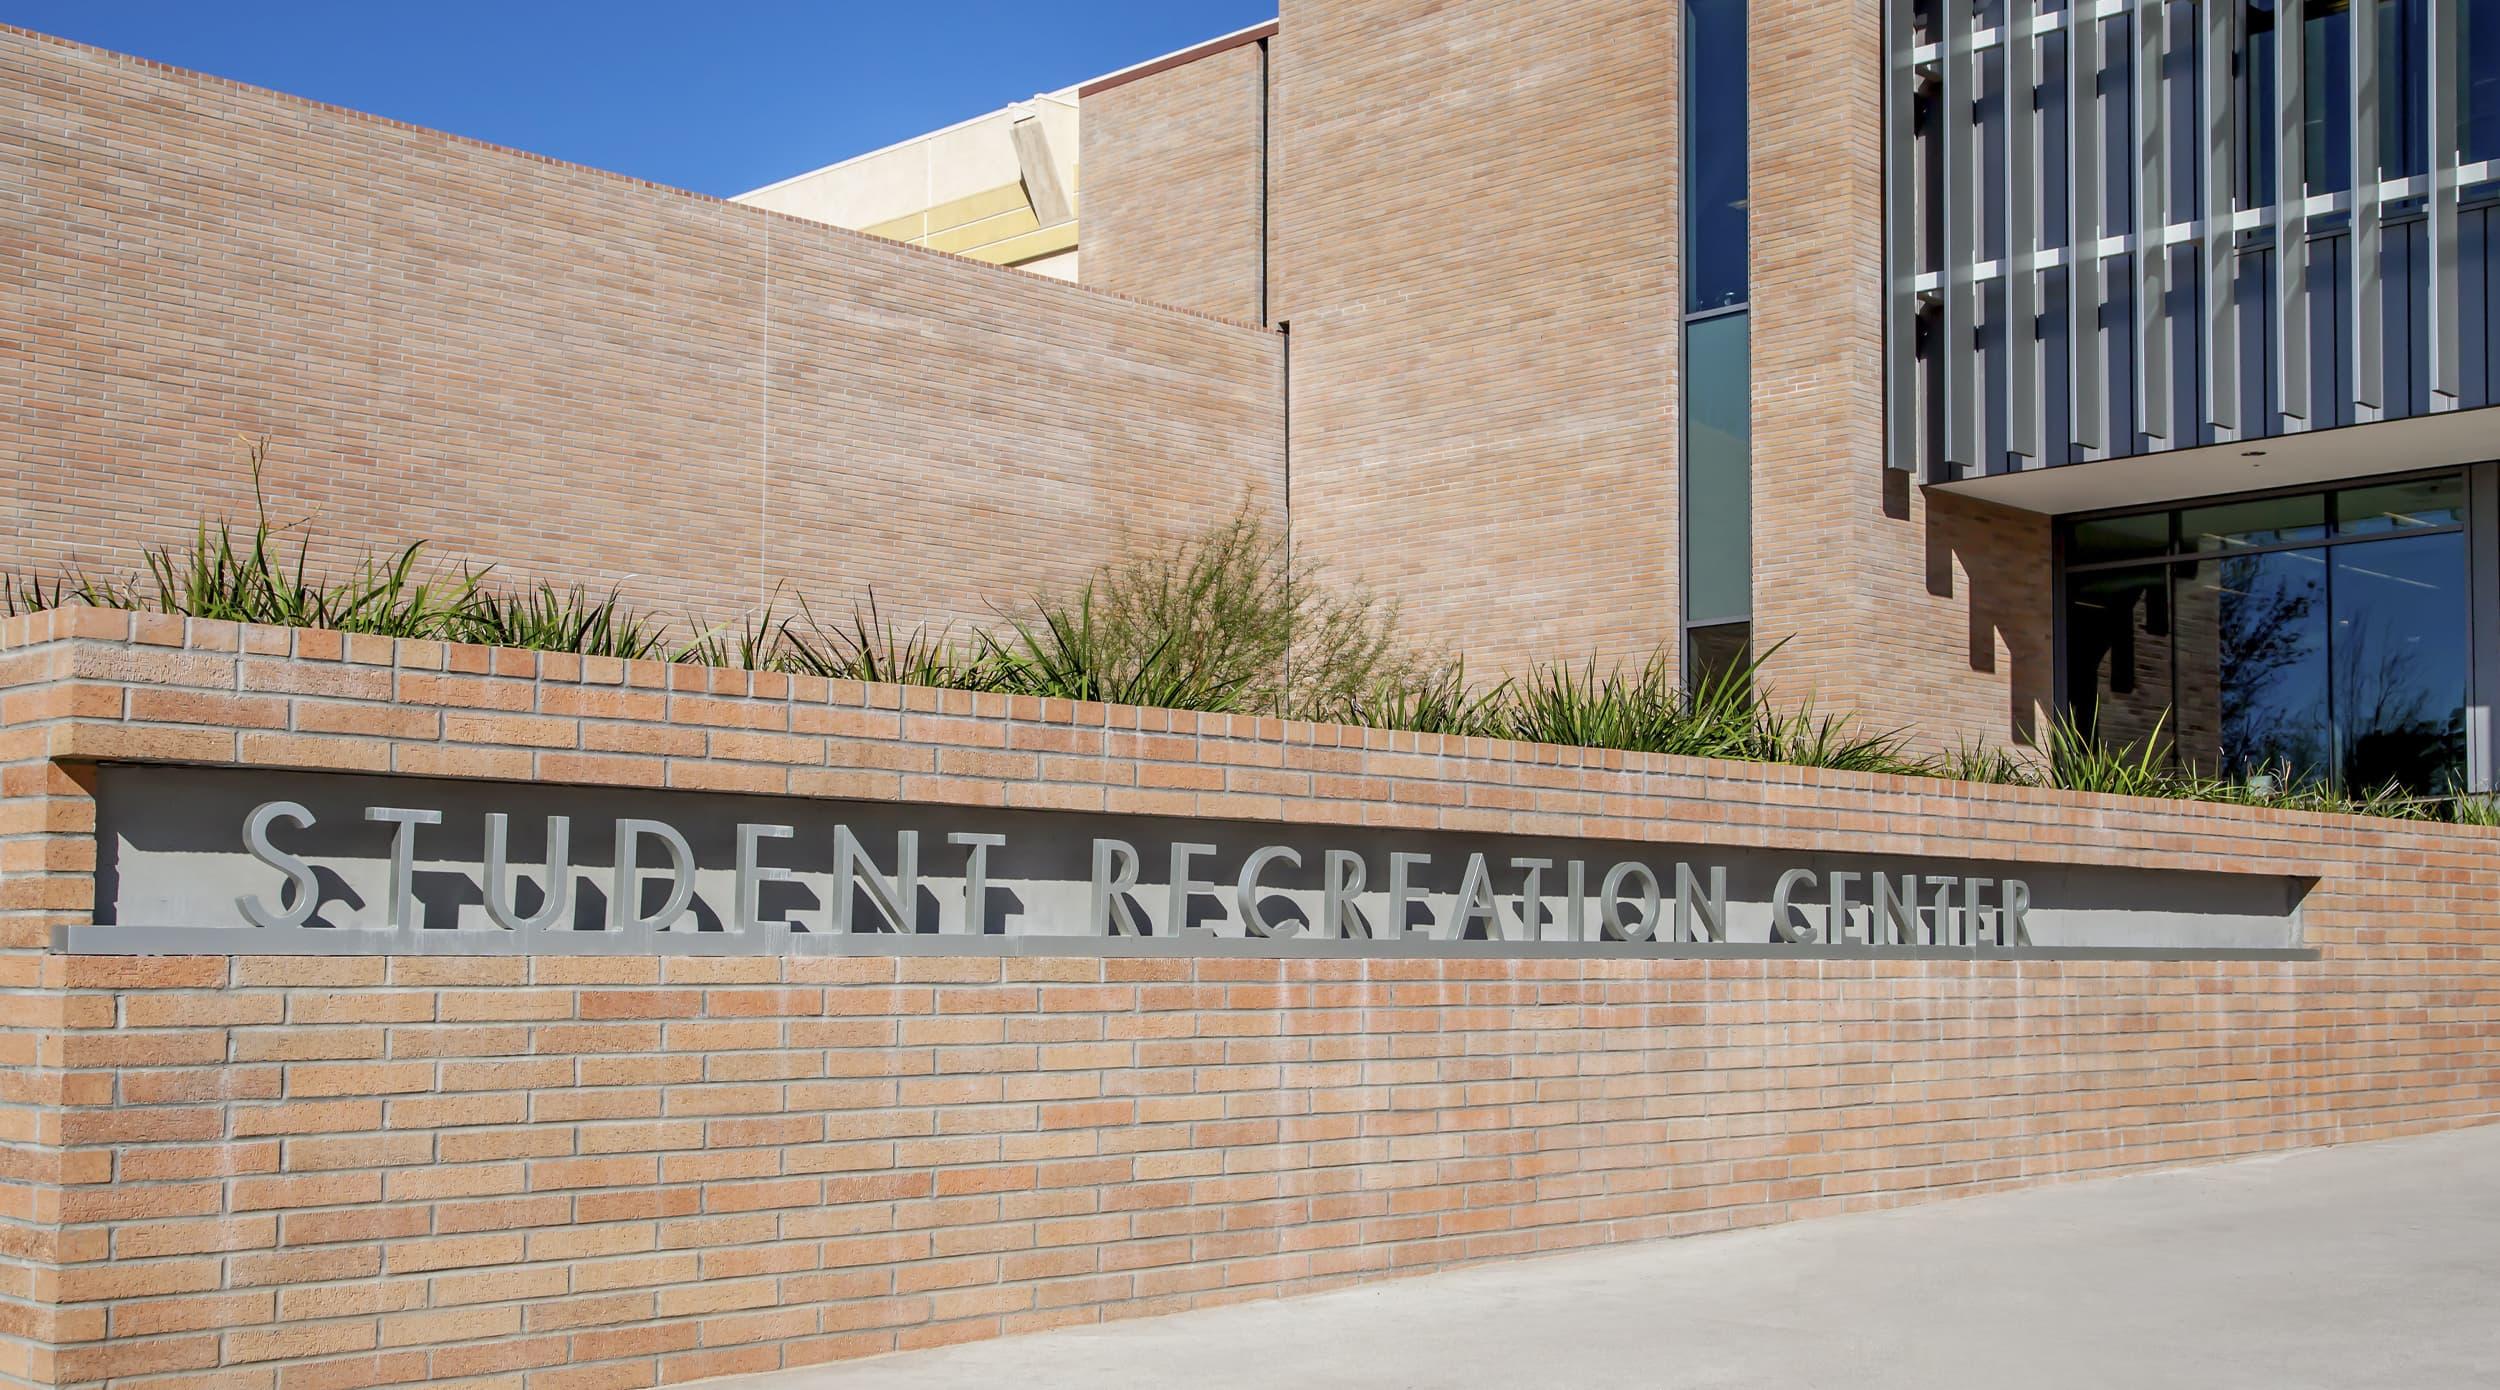 University of California, Riverside. Education Design. Recreational Design. Entertainment Design. RSM Design created Wayfinding Signage, Environmental Graphic Design.